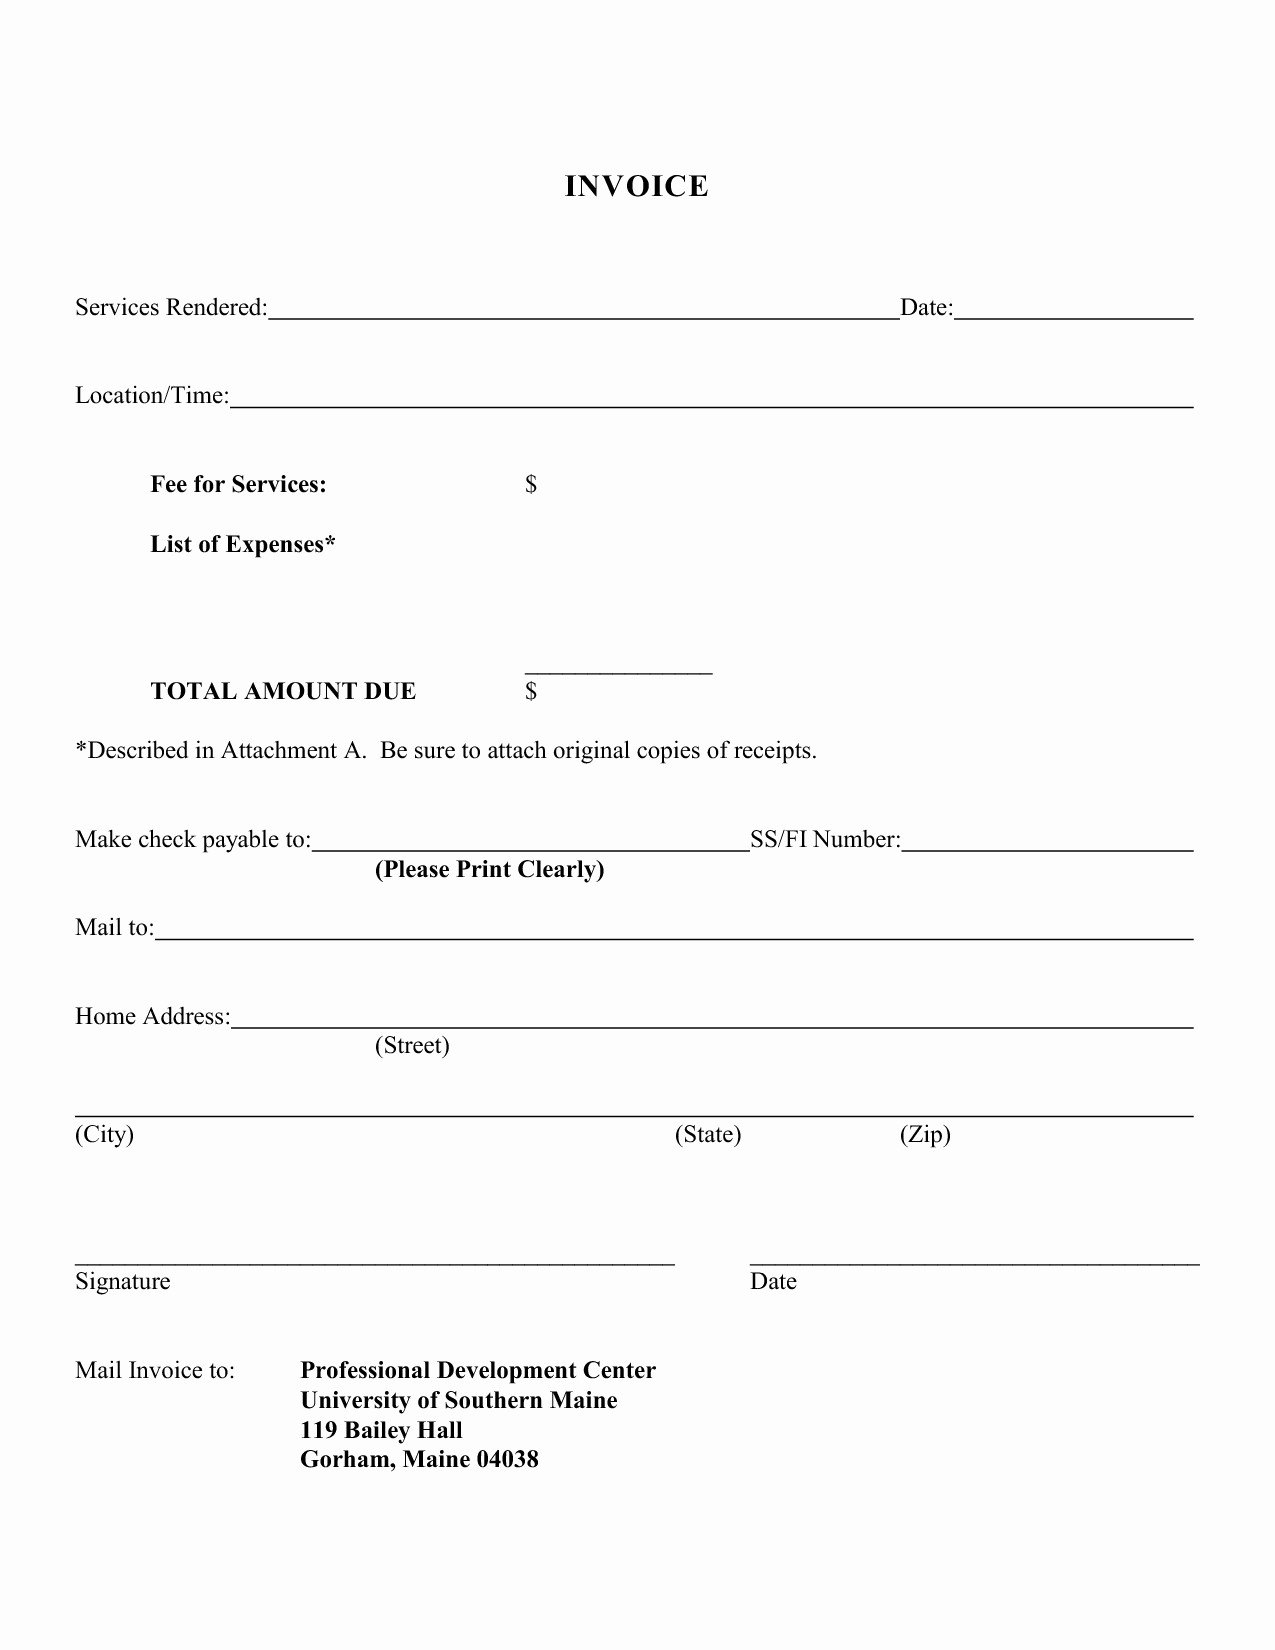 Sample Receipts for Services Rendered Elegant Free Template for Invoice for Services Rendered Invoice